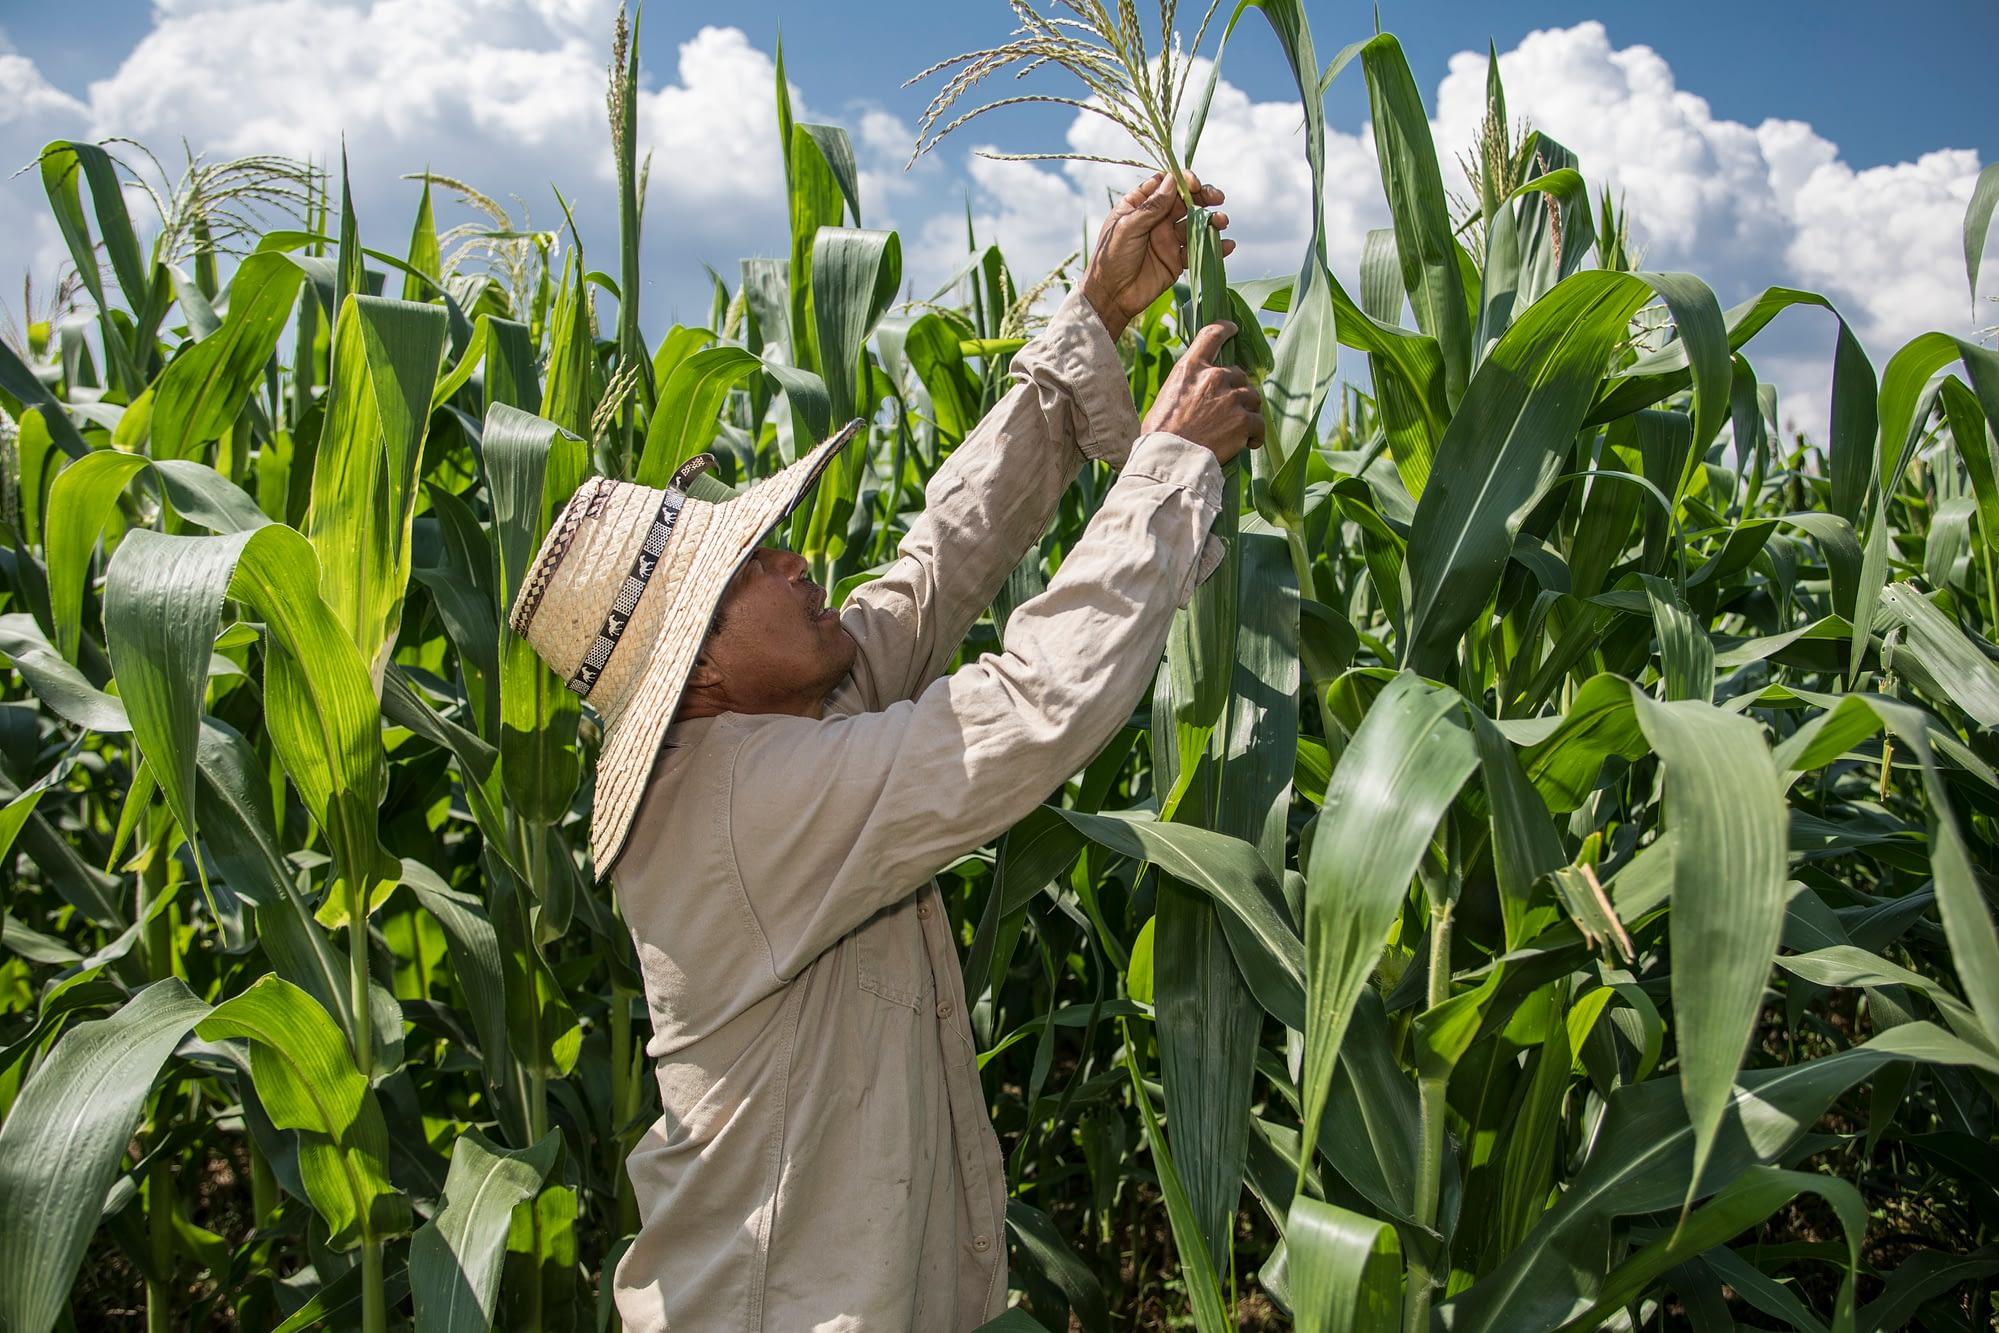 A farmer examines a zinc-enriched maize plant. (Photo: CIMMYT)